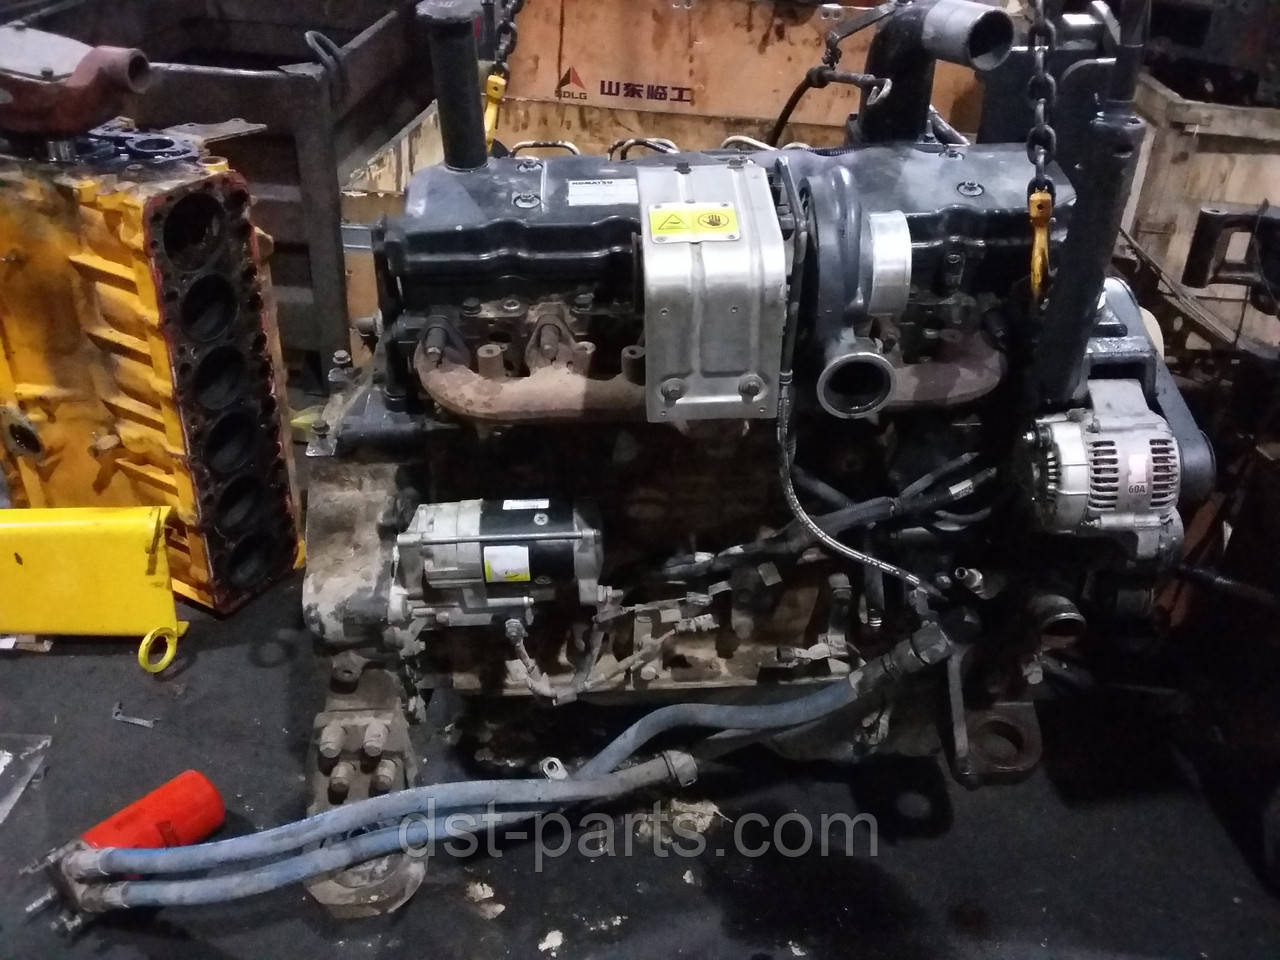 69c3785e8 Ремонт дизельного двигателя KOMATSU, цена 10 000 грн./услуга ...